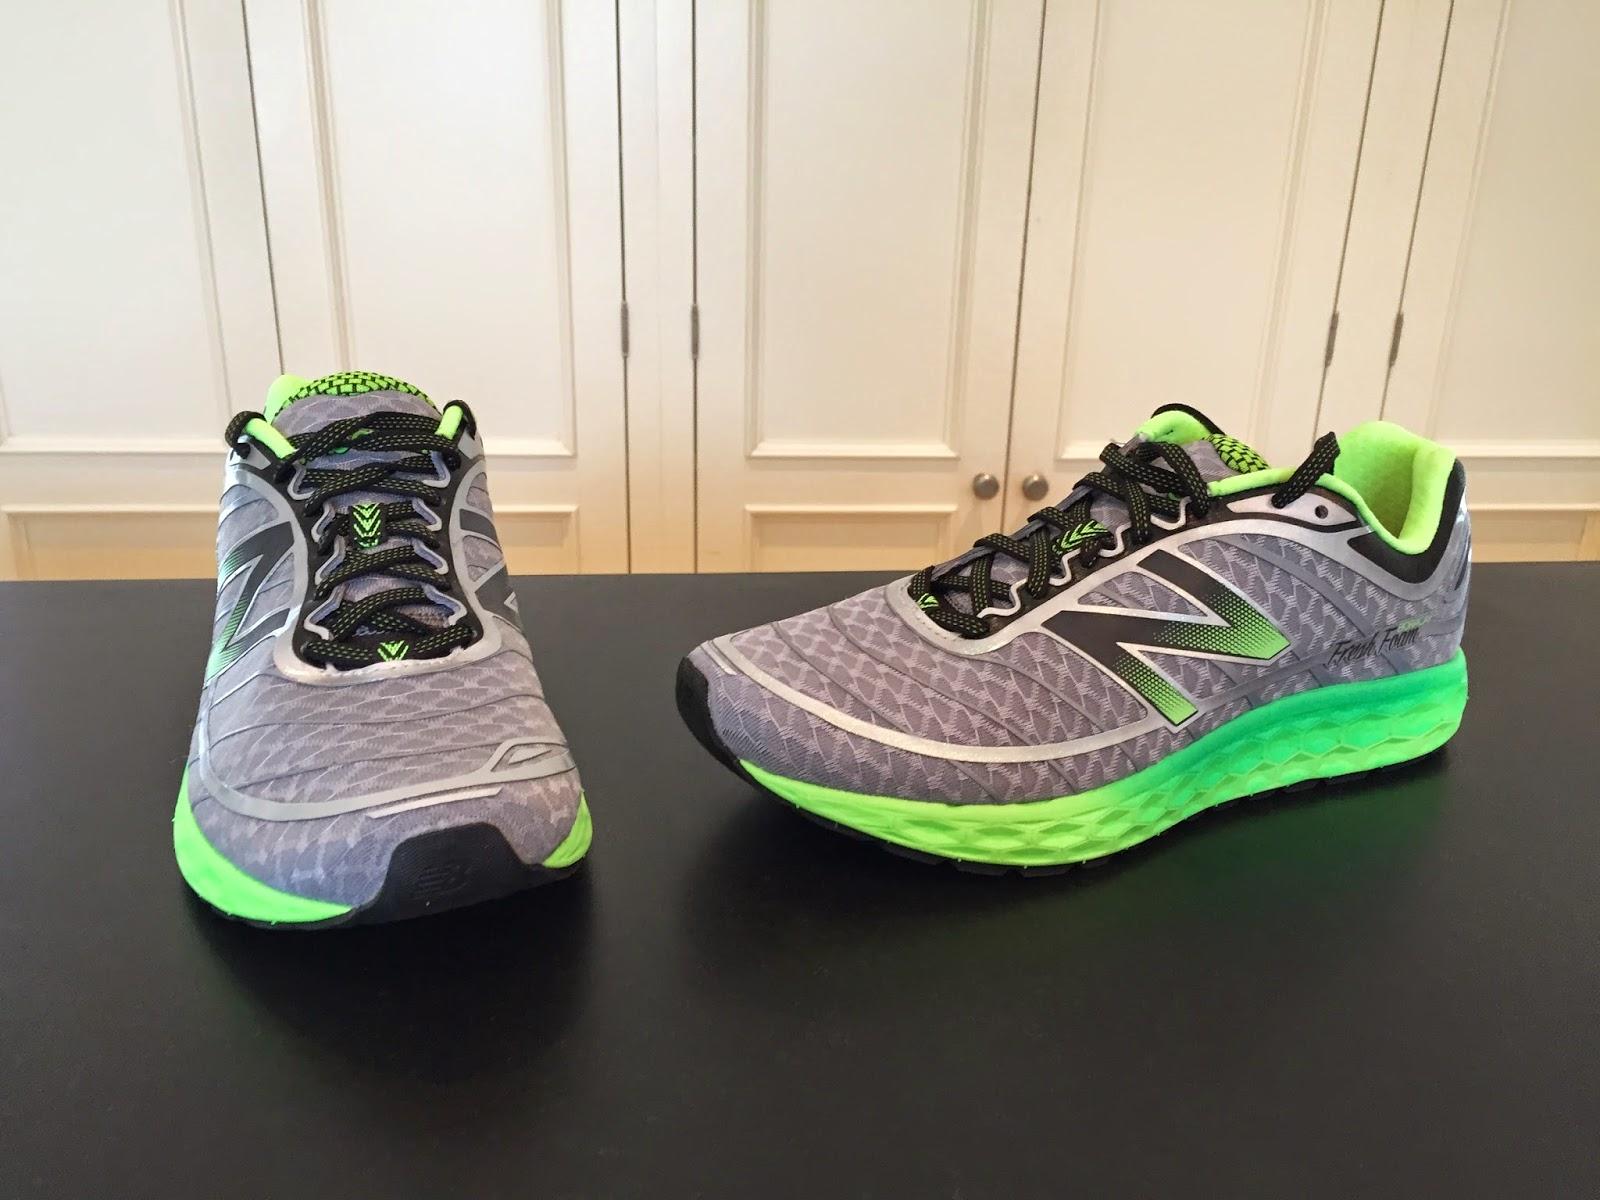 sneakers for cheap f4f34 dea68 Road Trail Run: Review: New Balance Fresh Foam Boracay-2nd ...